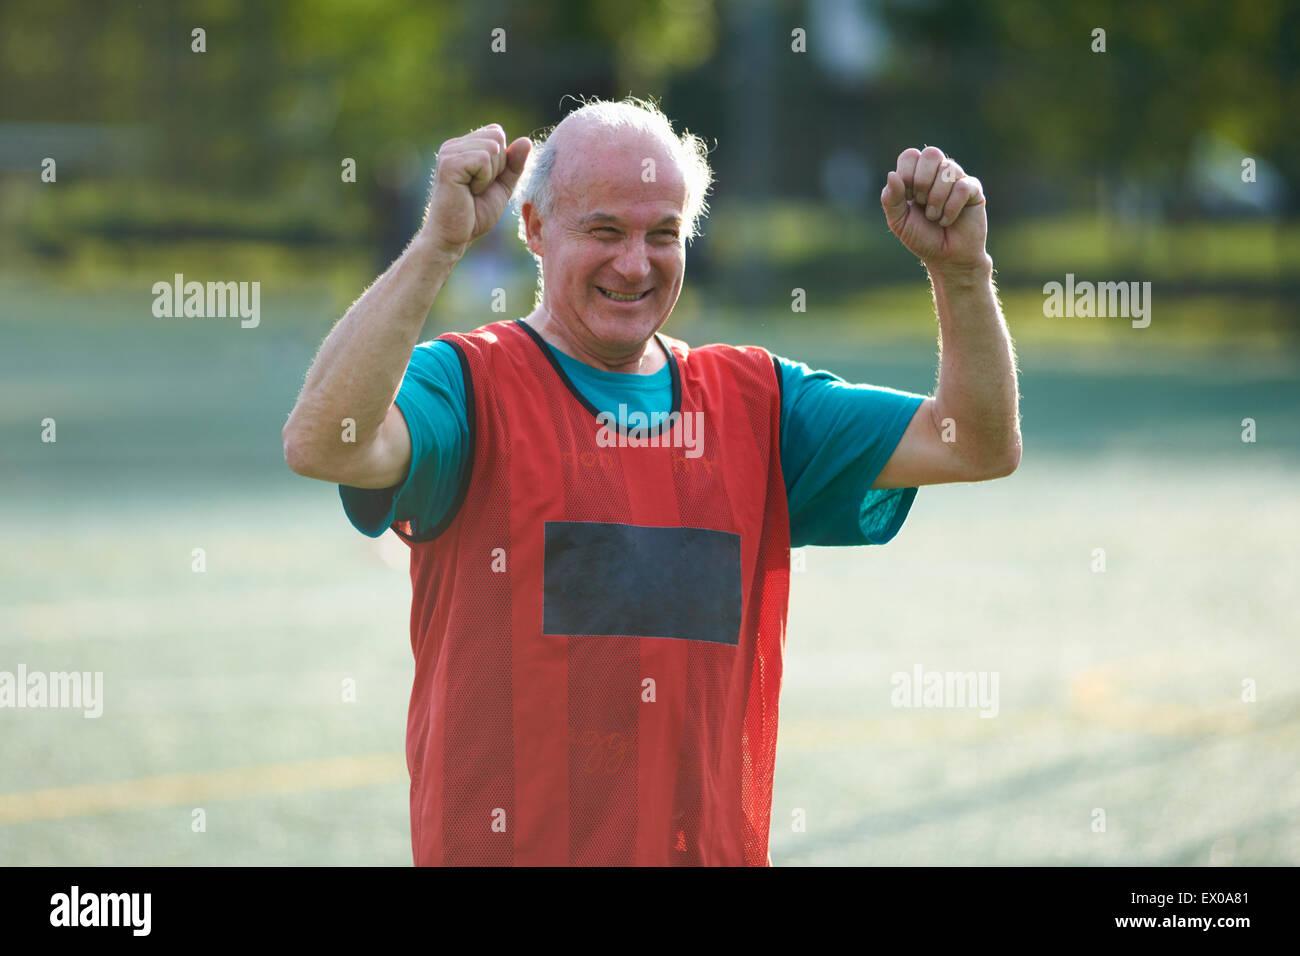 Senior man wearing sports bib cheering - Stock Image